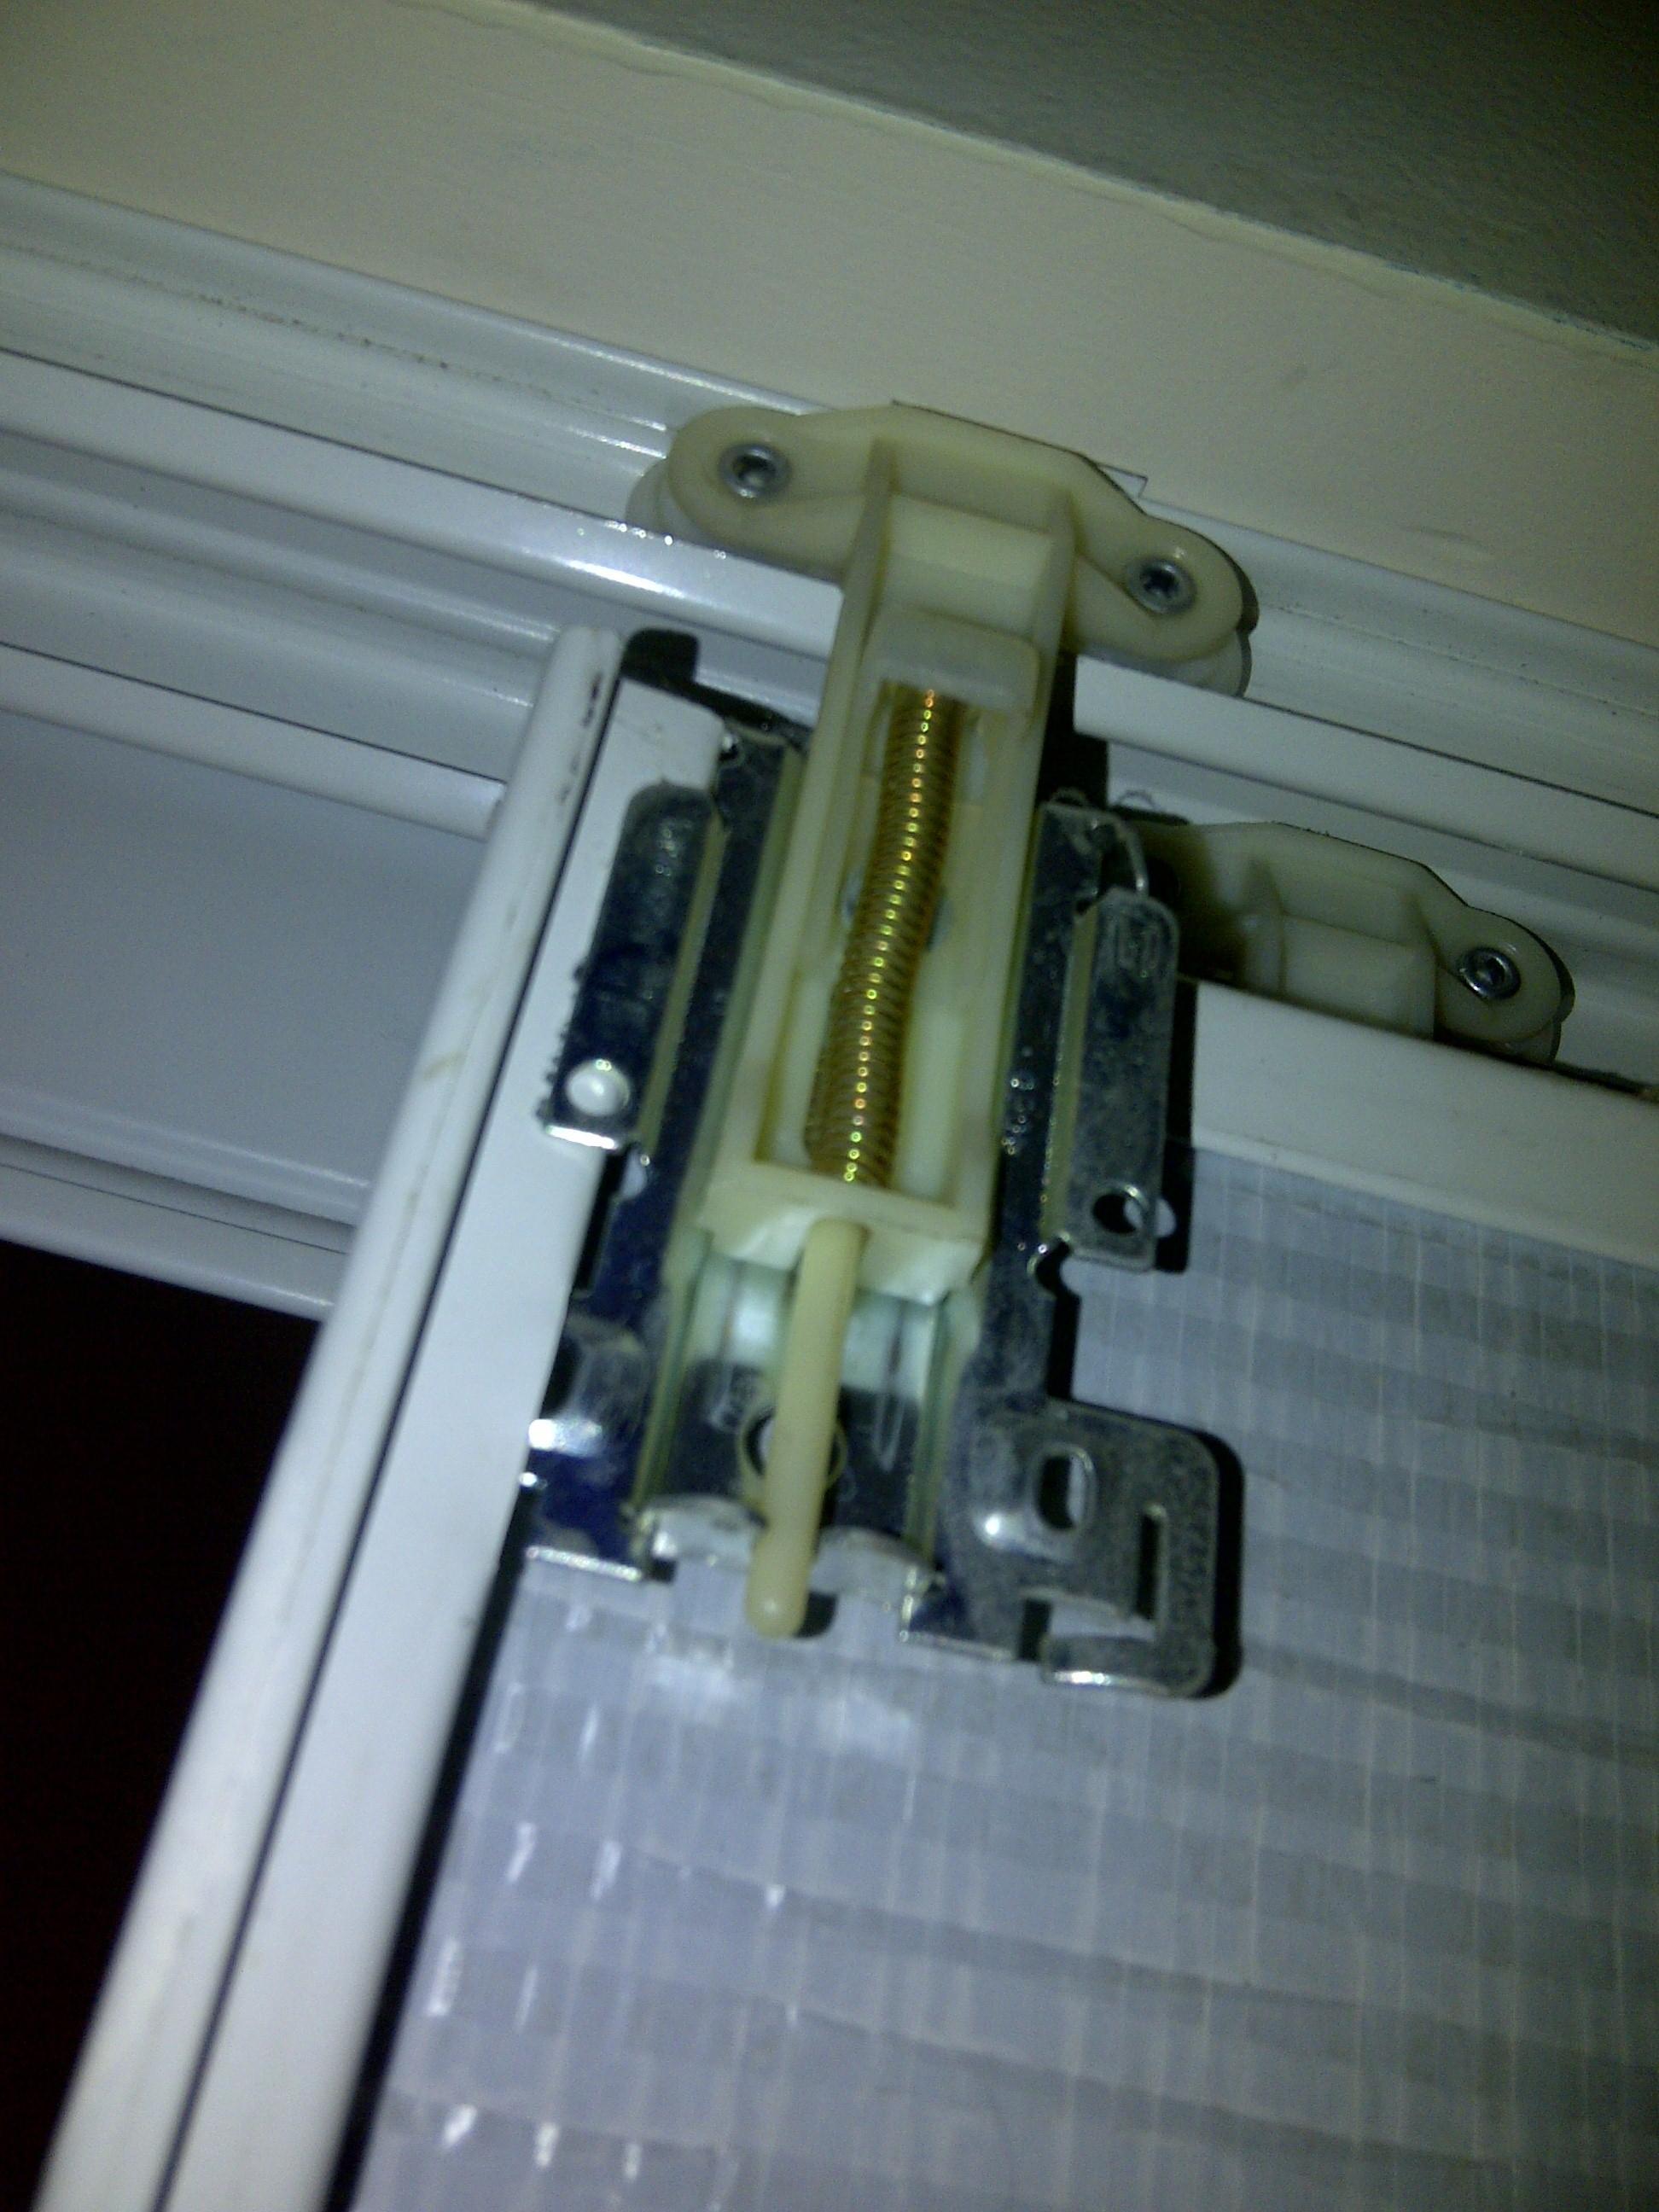 Sliding Wardrobe Door Tracks And Rollerssliding wardrobe door tracks and wheels sliding doors design